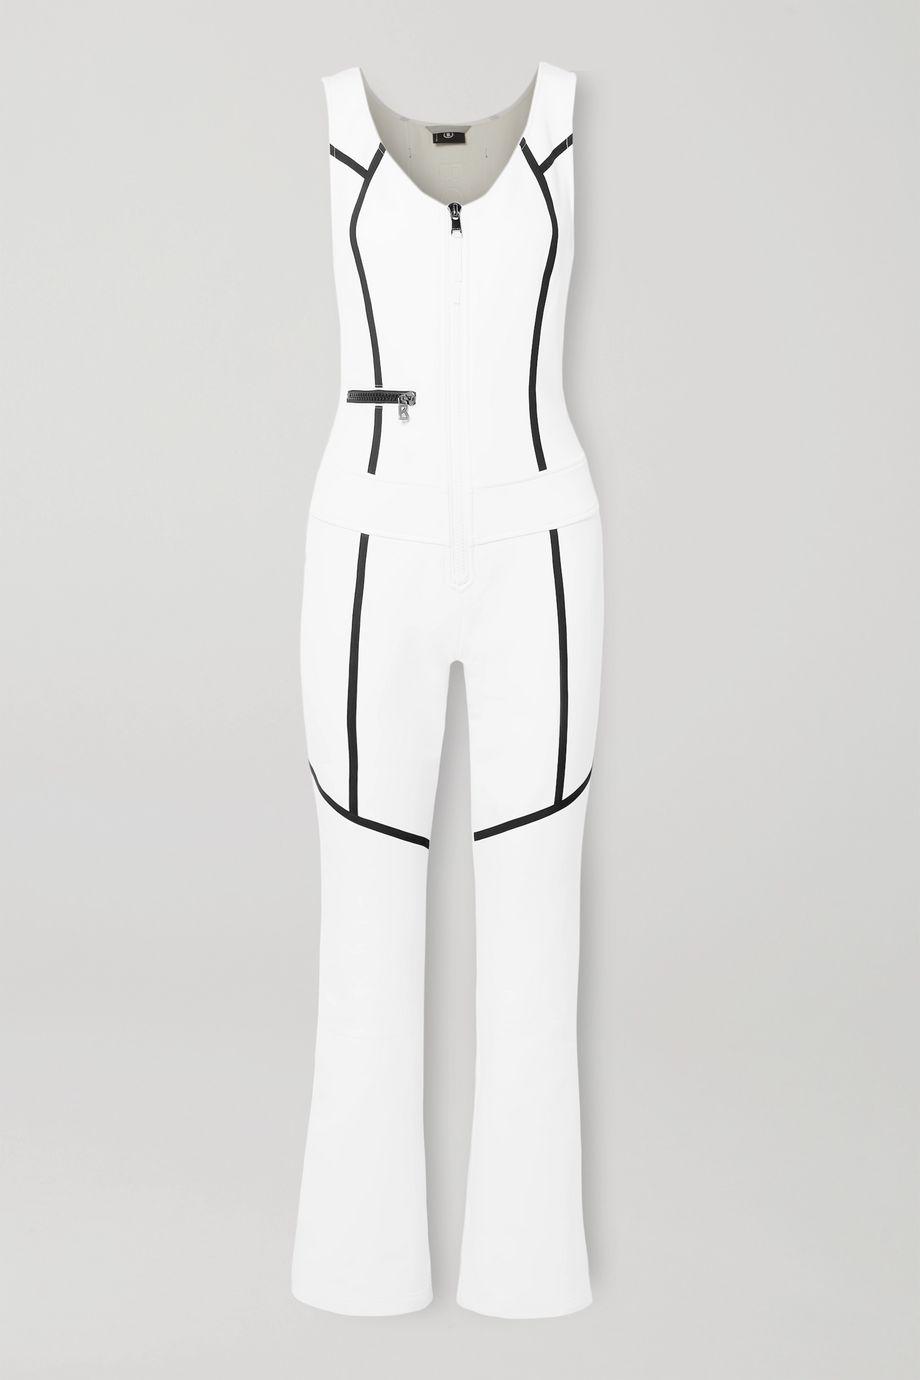 Bogner Terri striped stretch ski suit